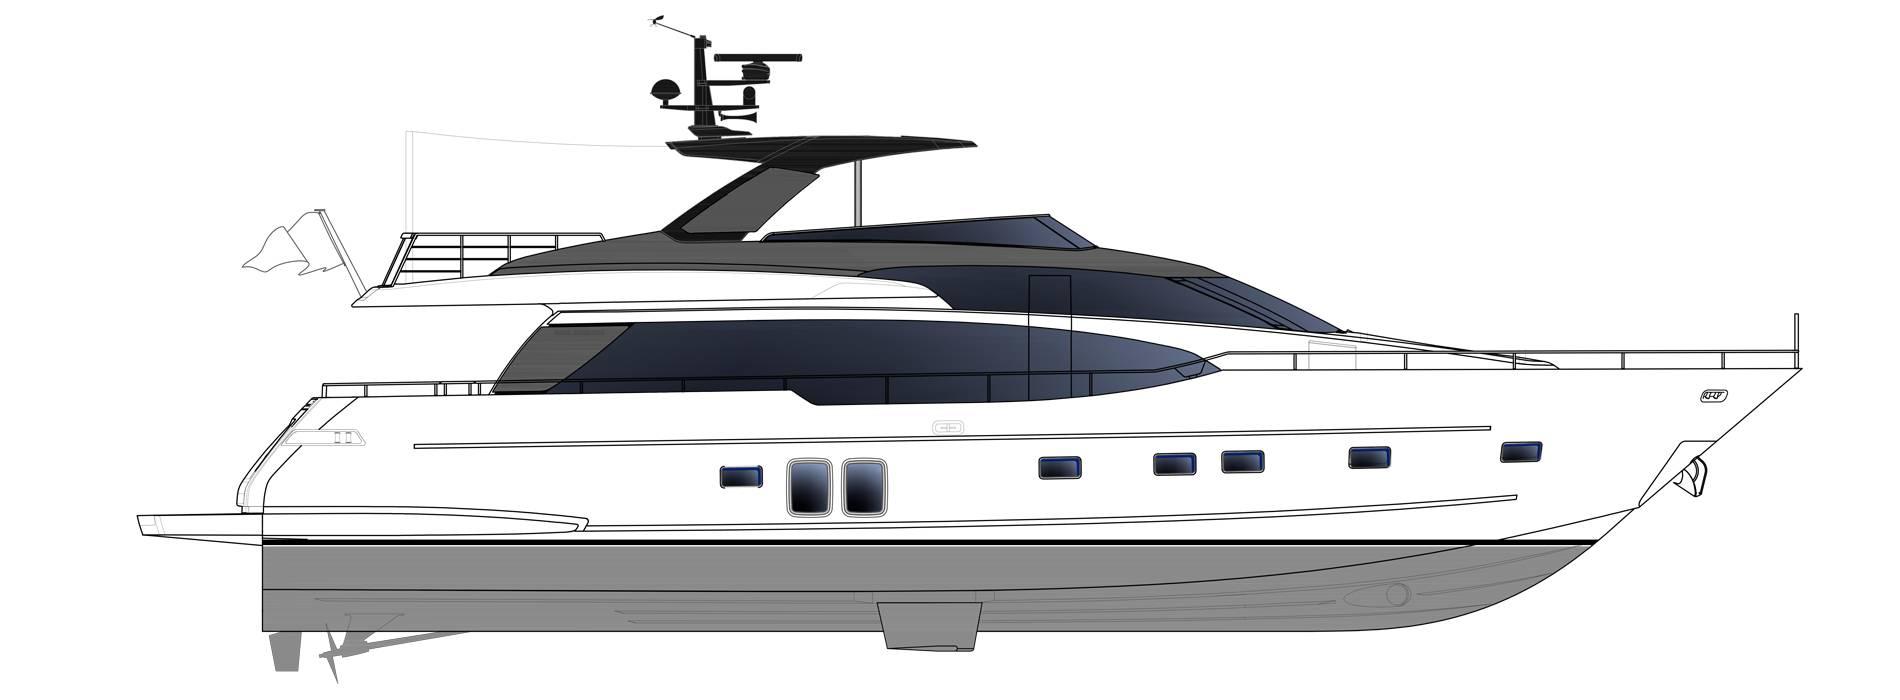 Sanlorenzo Yachts SL78-695 Profilo